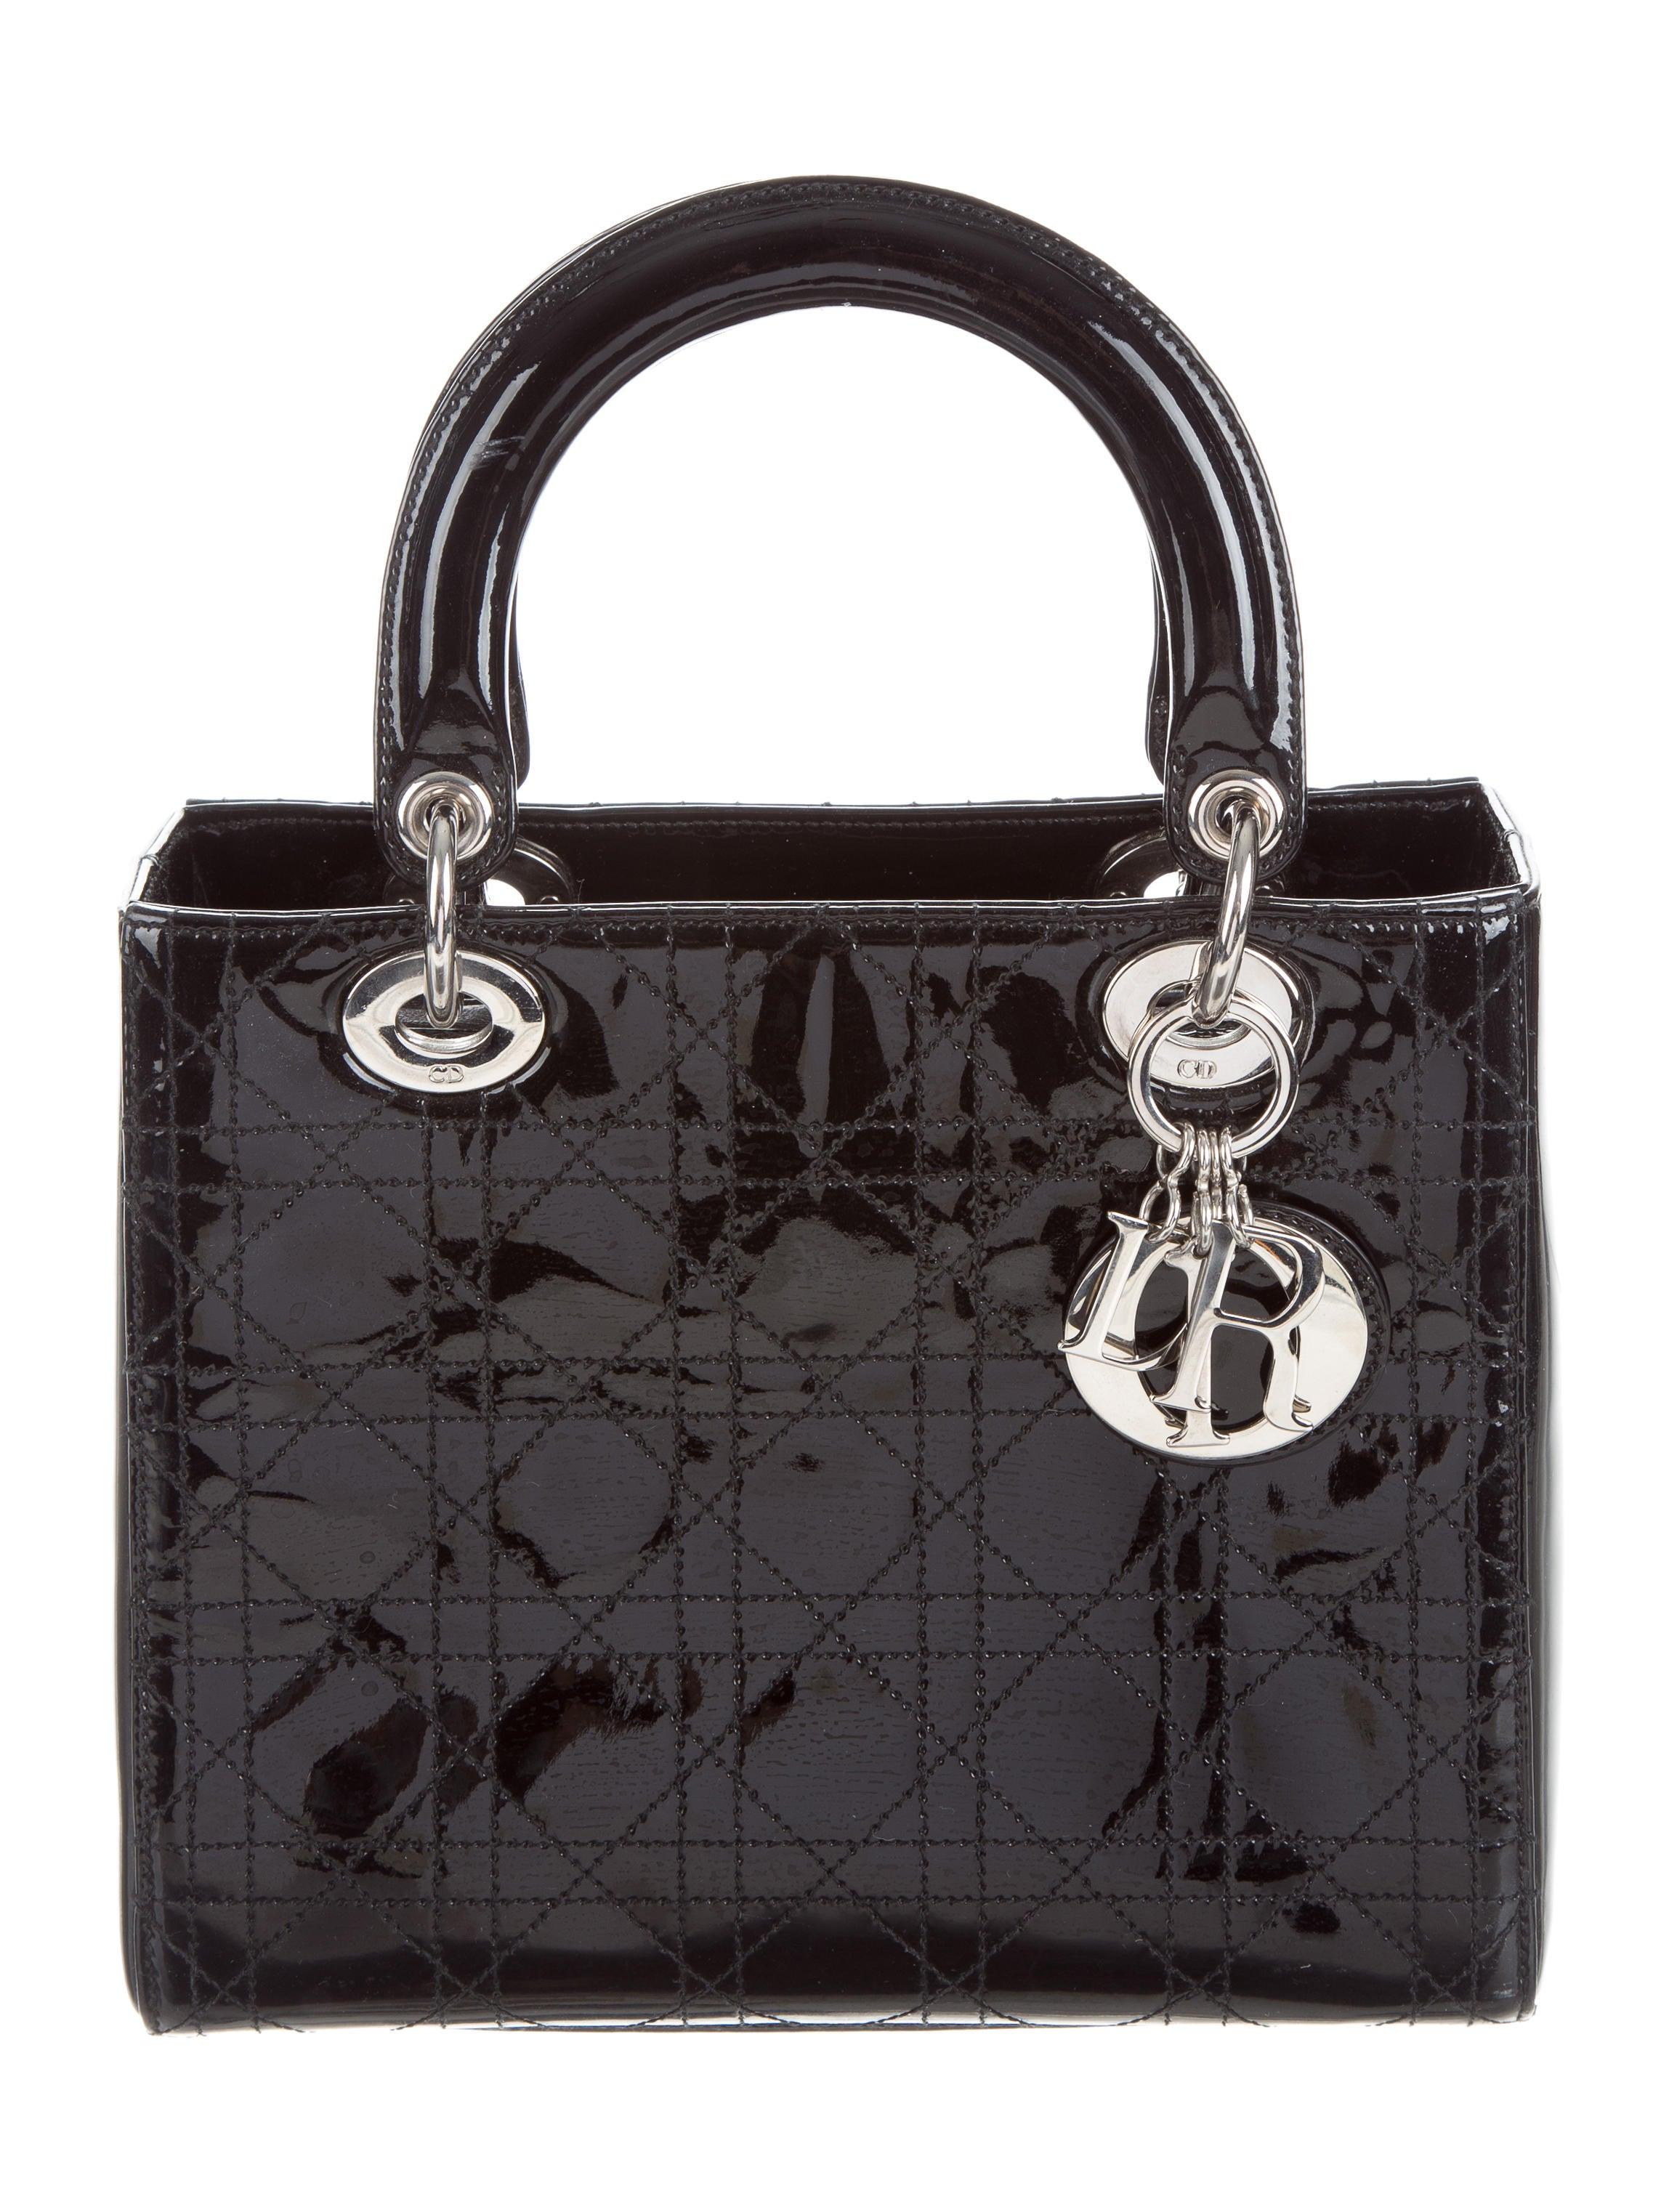 7ea39b9b7466 Christian Dior Patent Medium Lady Dior Bag - Handbags - CHR58764 | The  RealReal